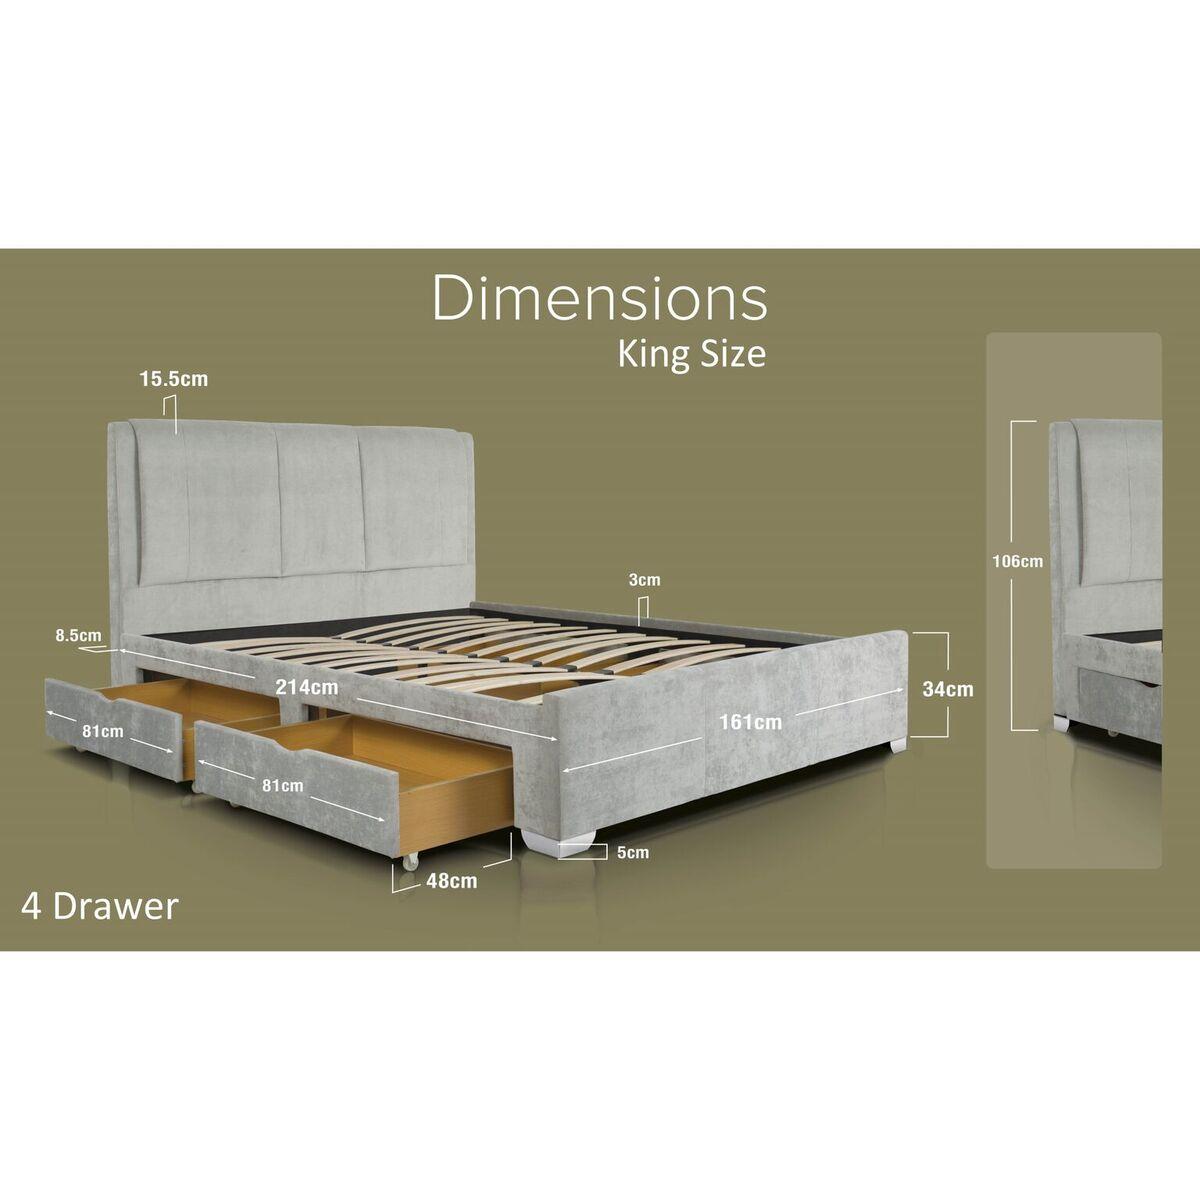 Edgar Light Grey Crushed Velvet Bed Storage Drawers Dimensions King